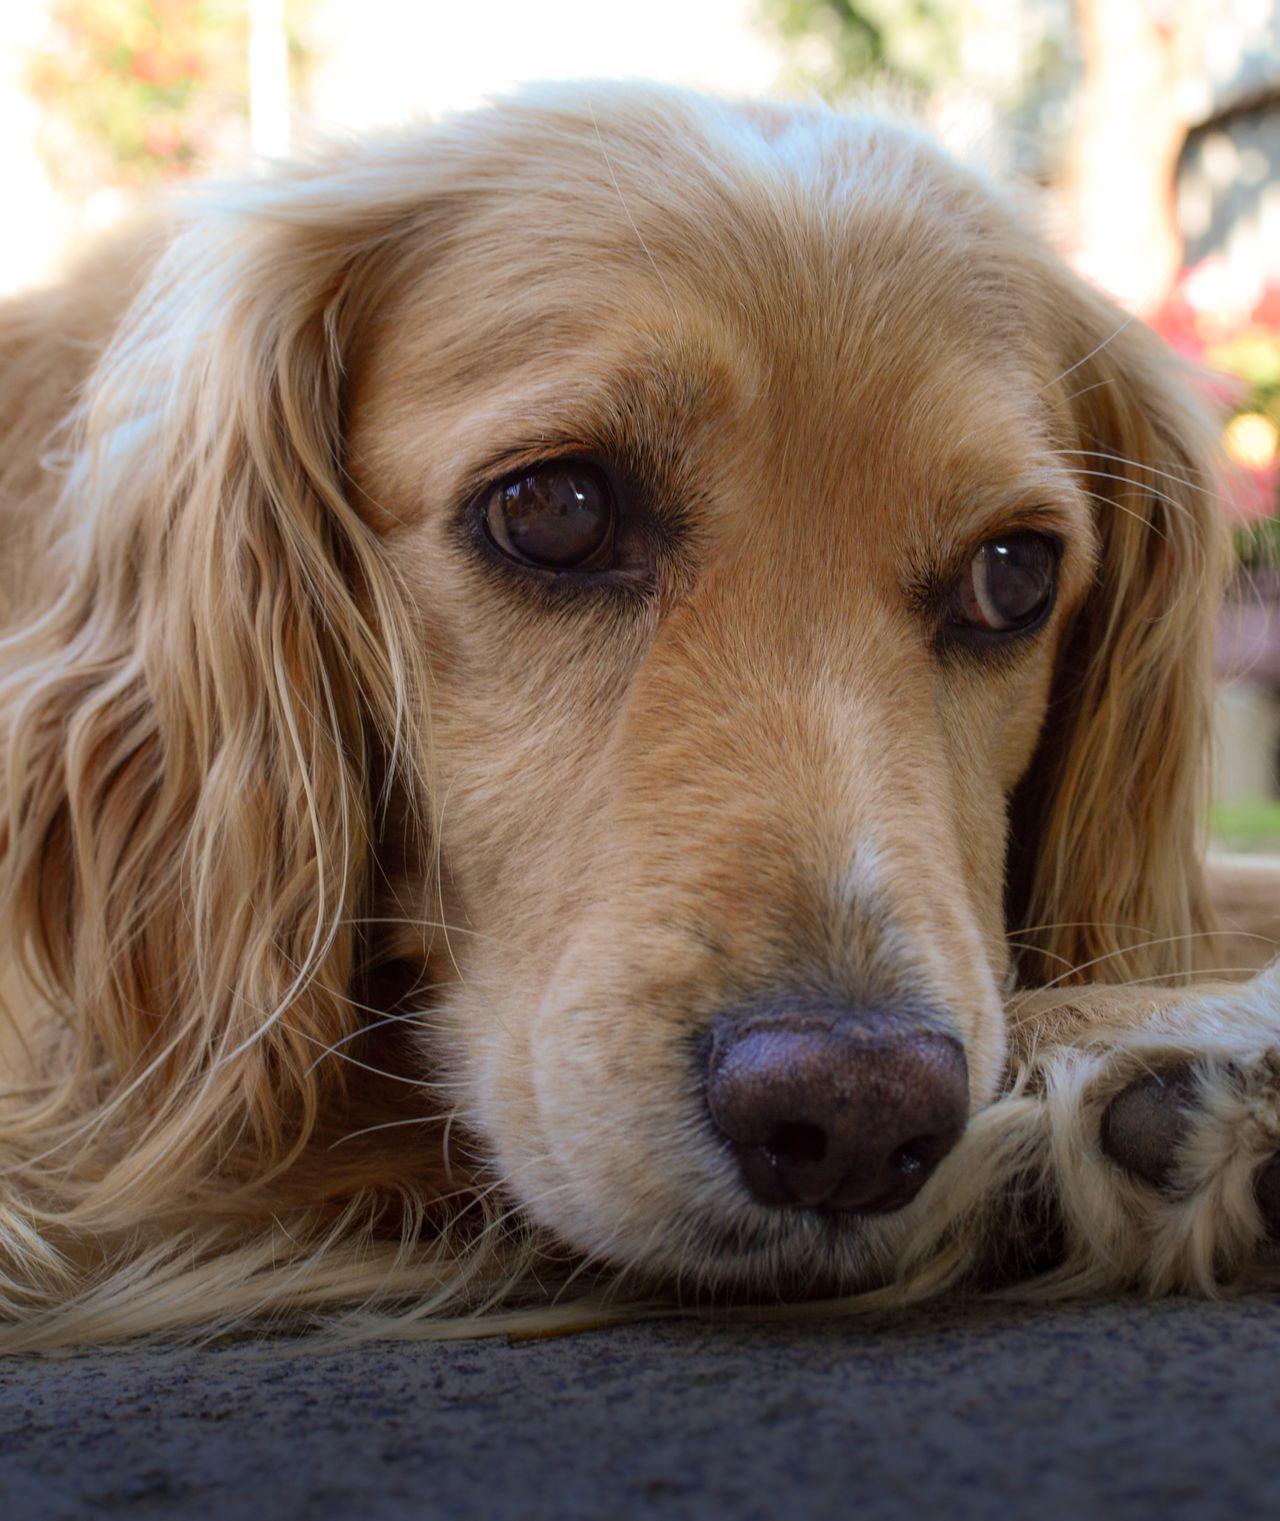 I Love My Dog My Dog My Dog <3 Ckoker Spaniel Hello World Taking Photos Enjoying Life IPhone IPhoneography